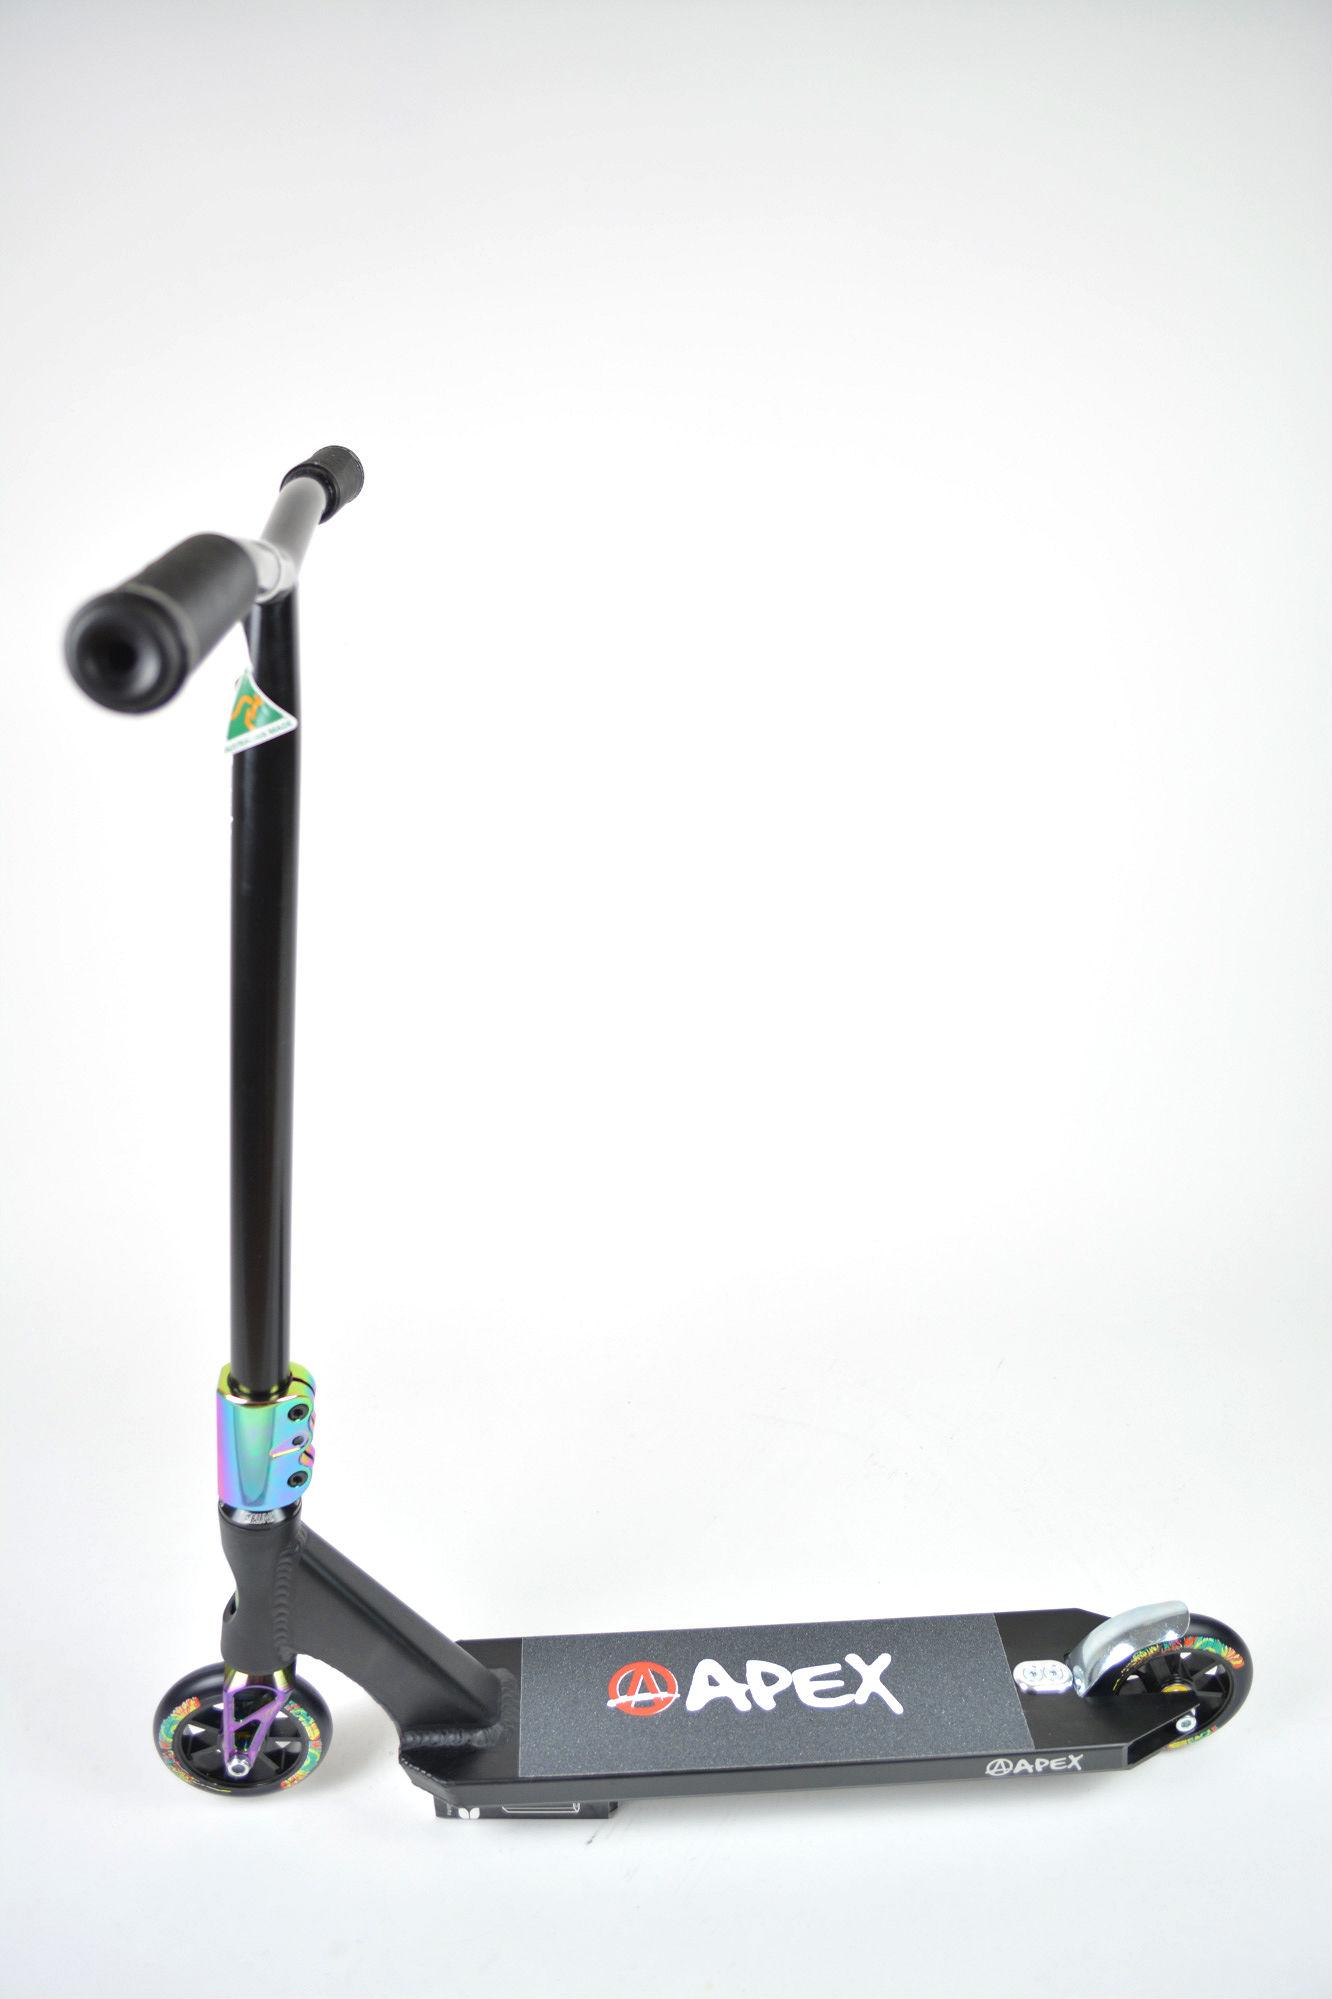 Apex Drone Custom Stunt Scooter